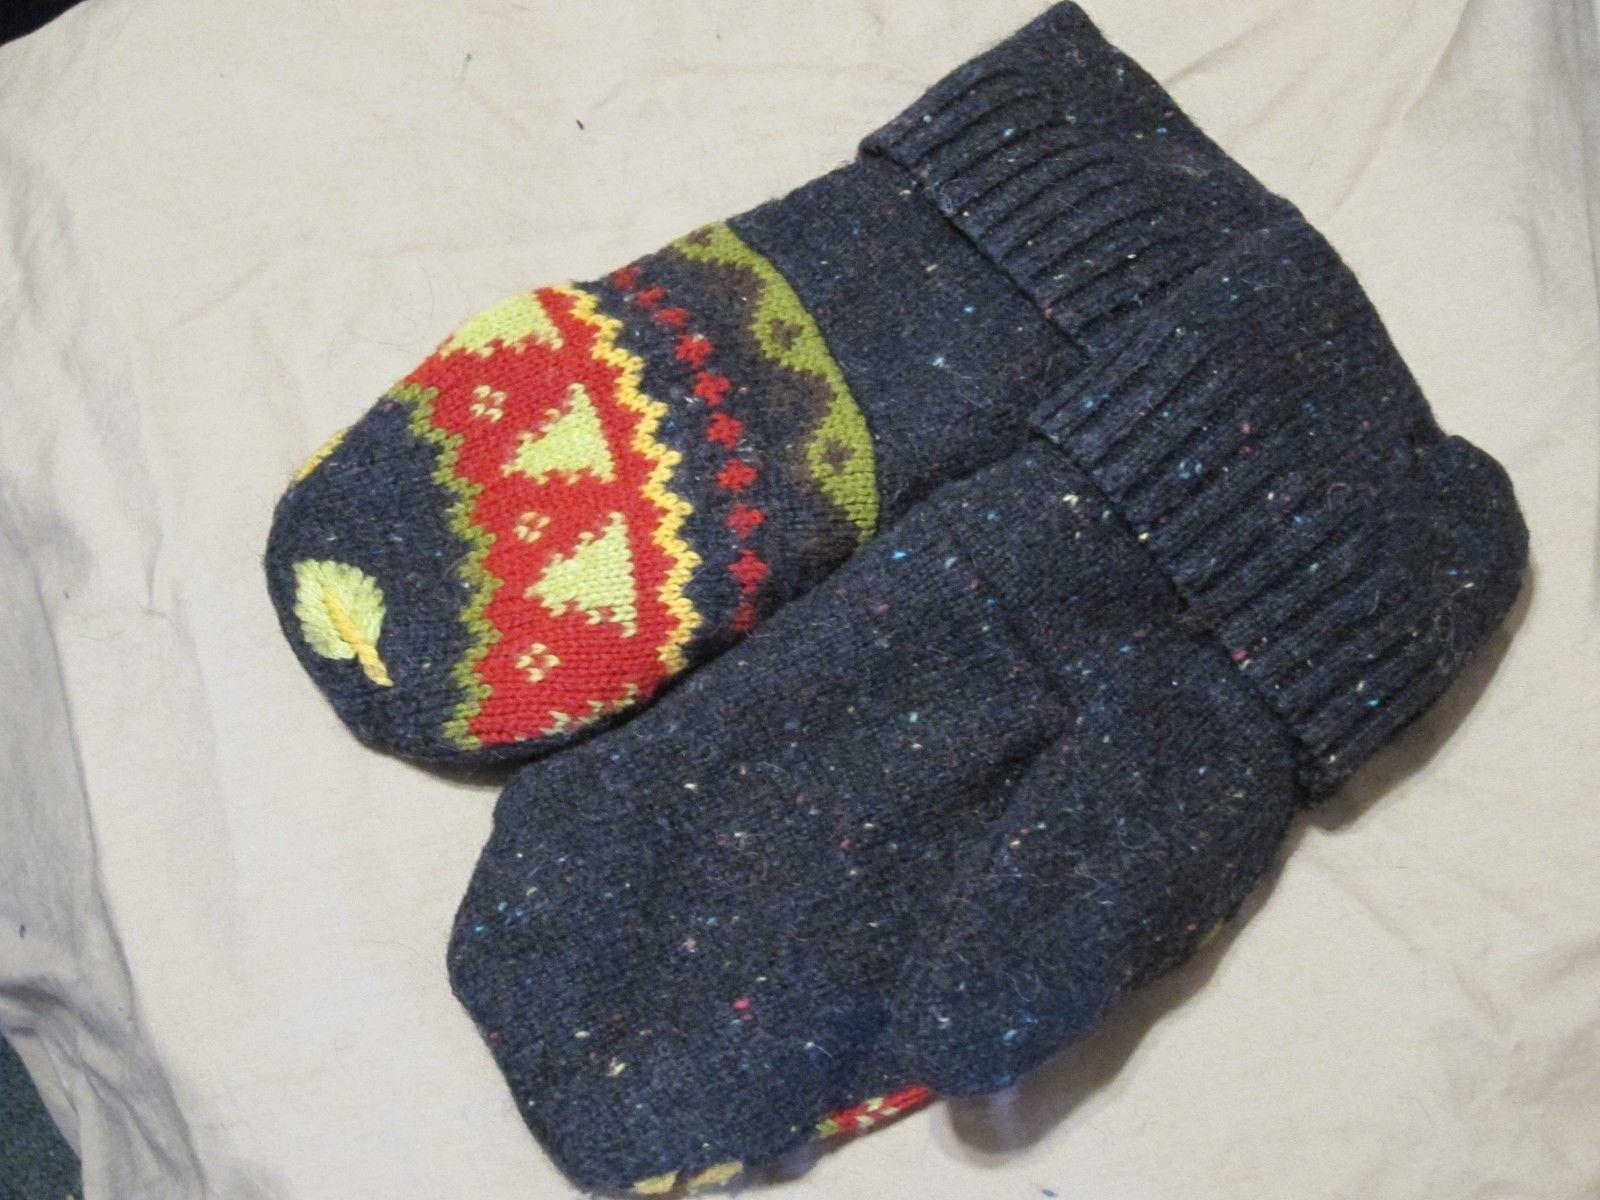 Handmade Recycled Wool Fleece Lined Mittens Black w Trees Ladies/Teens Size M/L